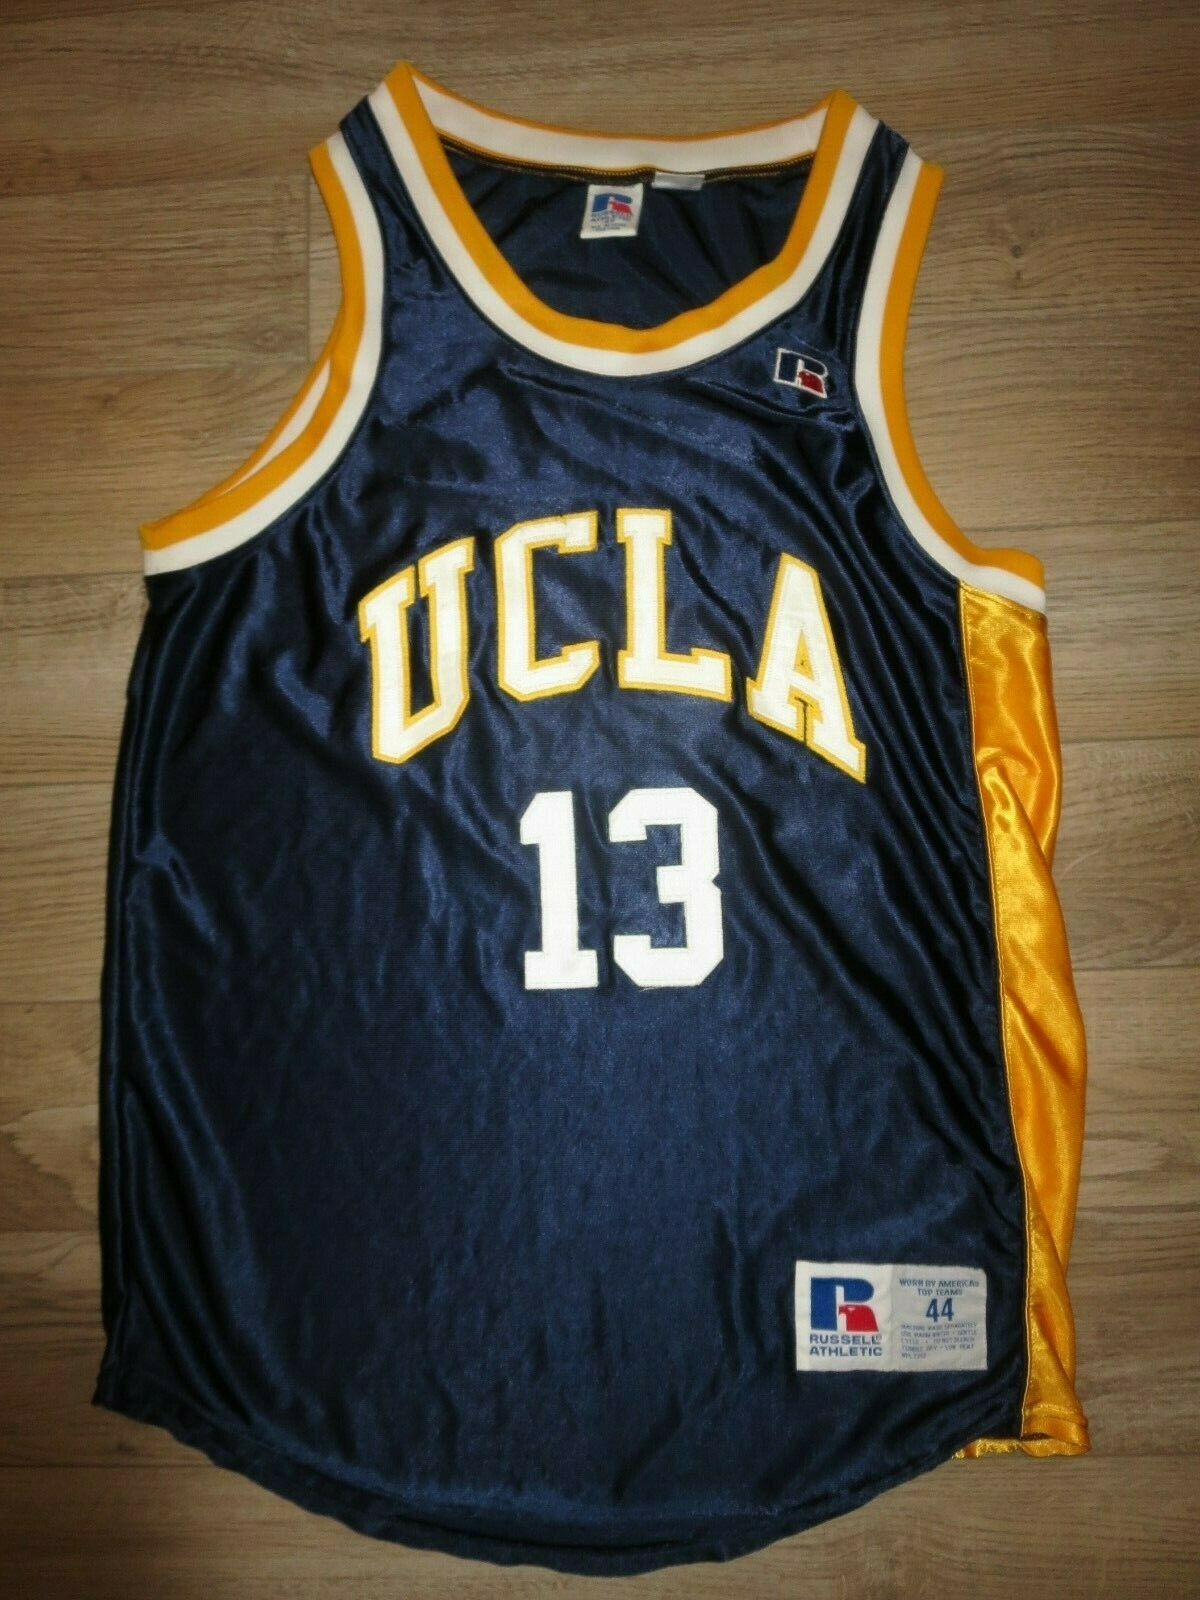 Ucla Bruins  13 Baloncesto Equipo damen Campeón Game Used Usada Camiseta 44